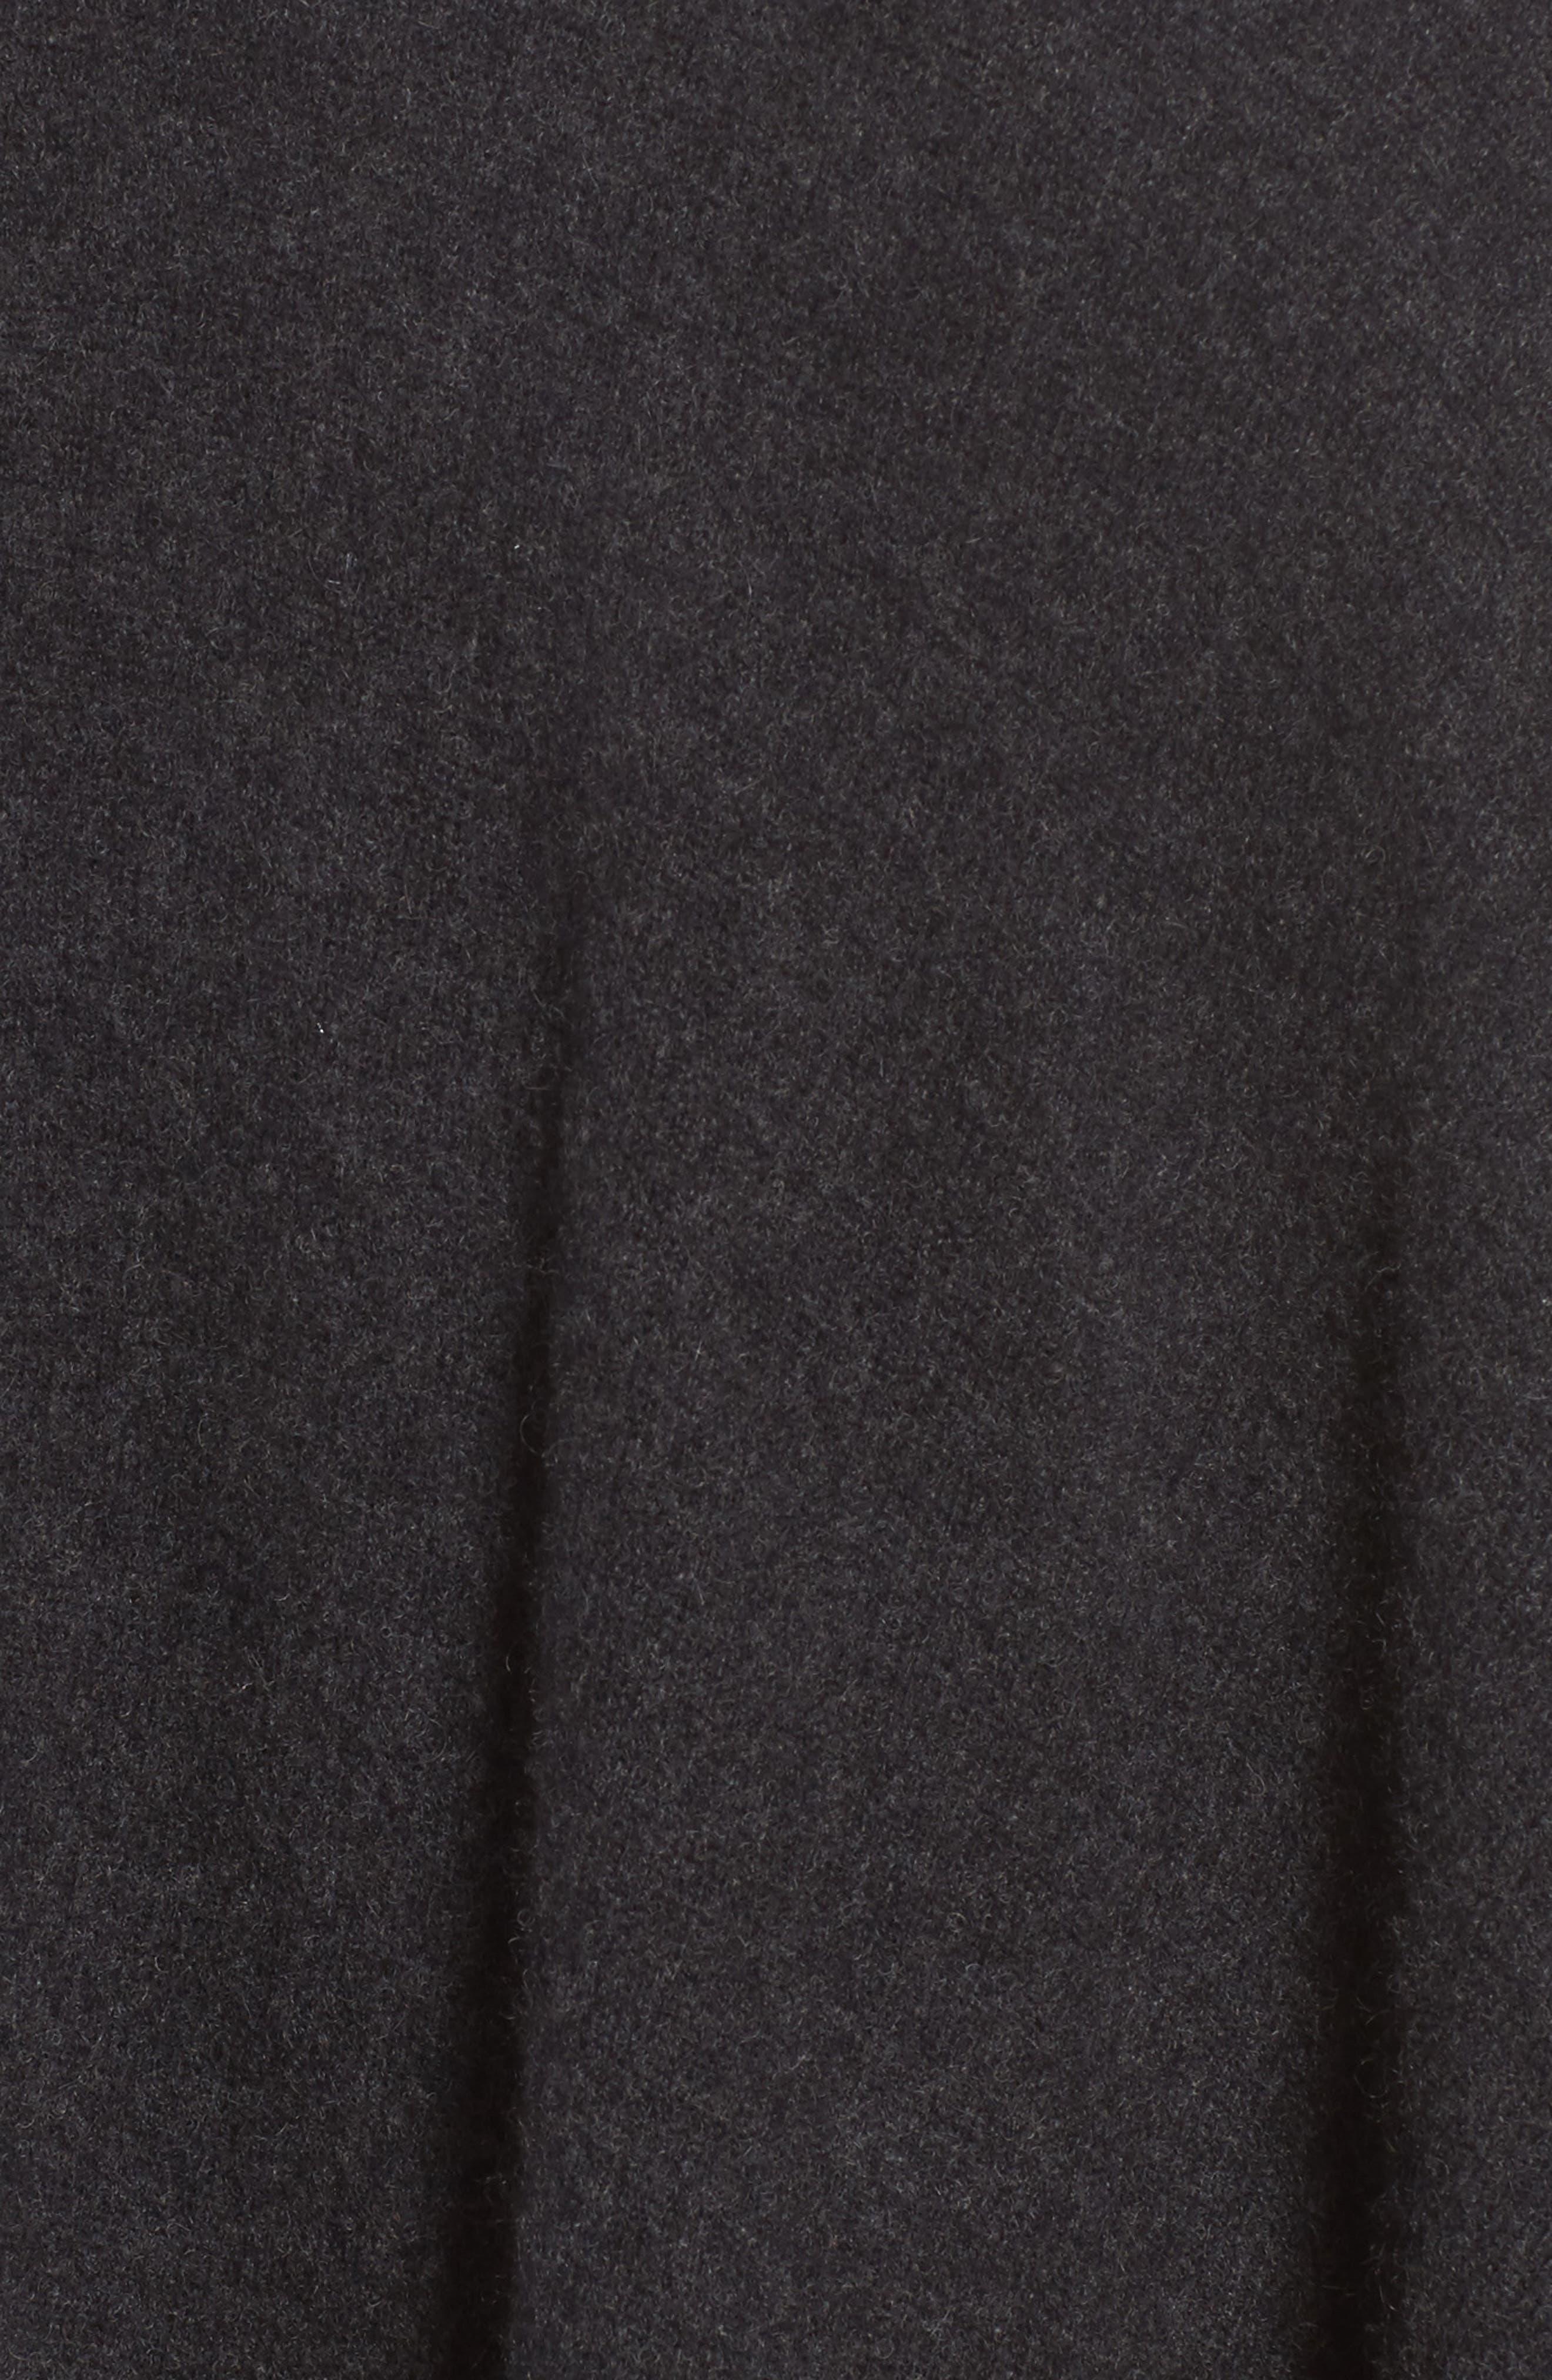 Luxe Stripe Cashmere Ruana,                             Alternate thumbnail 5, color,                             Black Rock Heather Combo